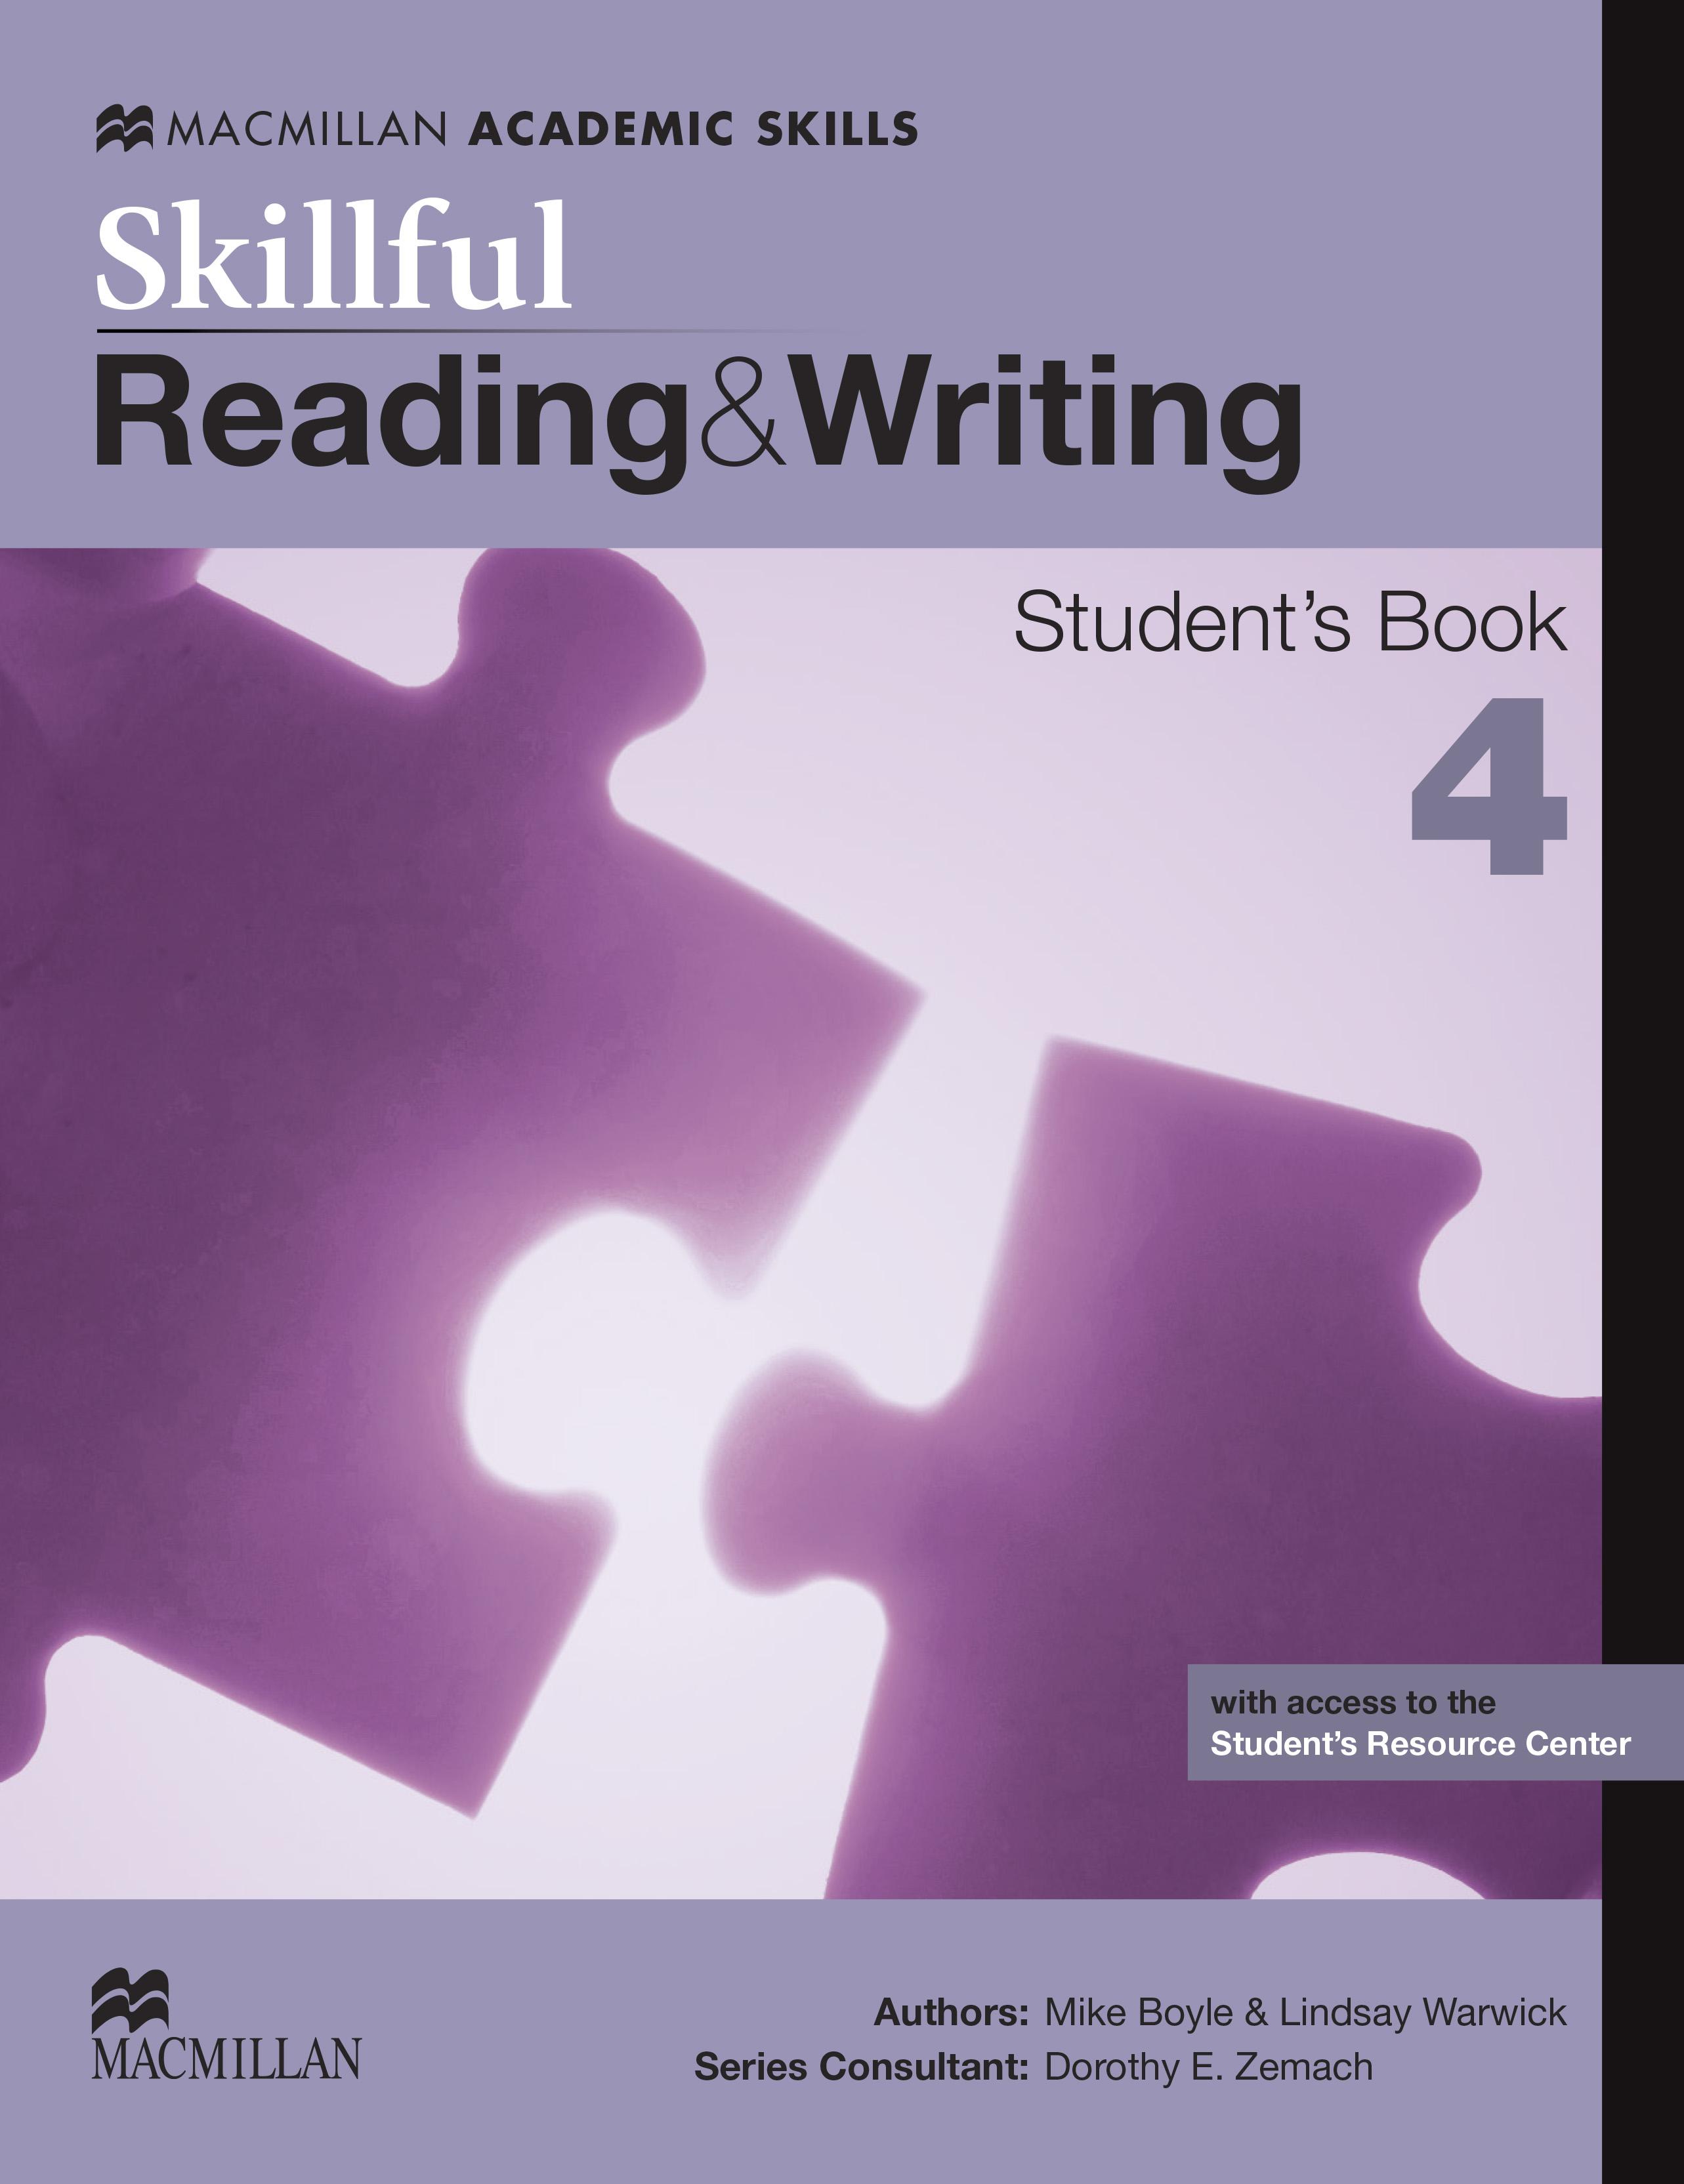 Skillful Level 4 Reading & Writing Student